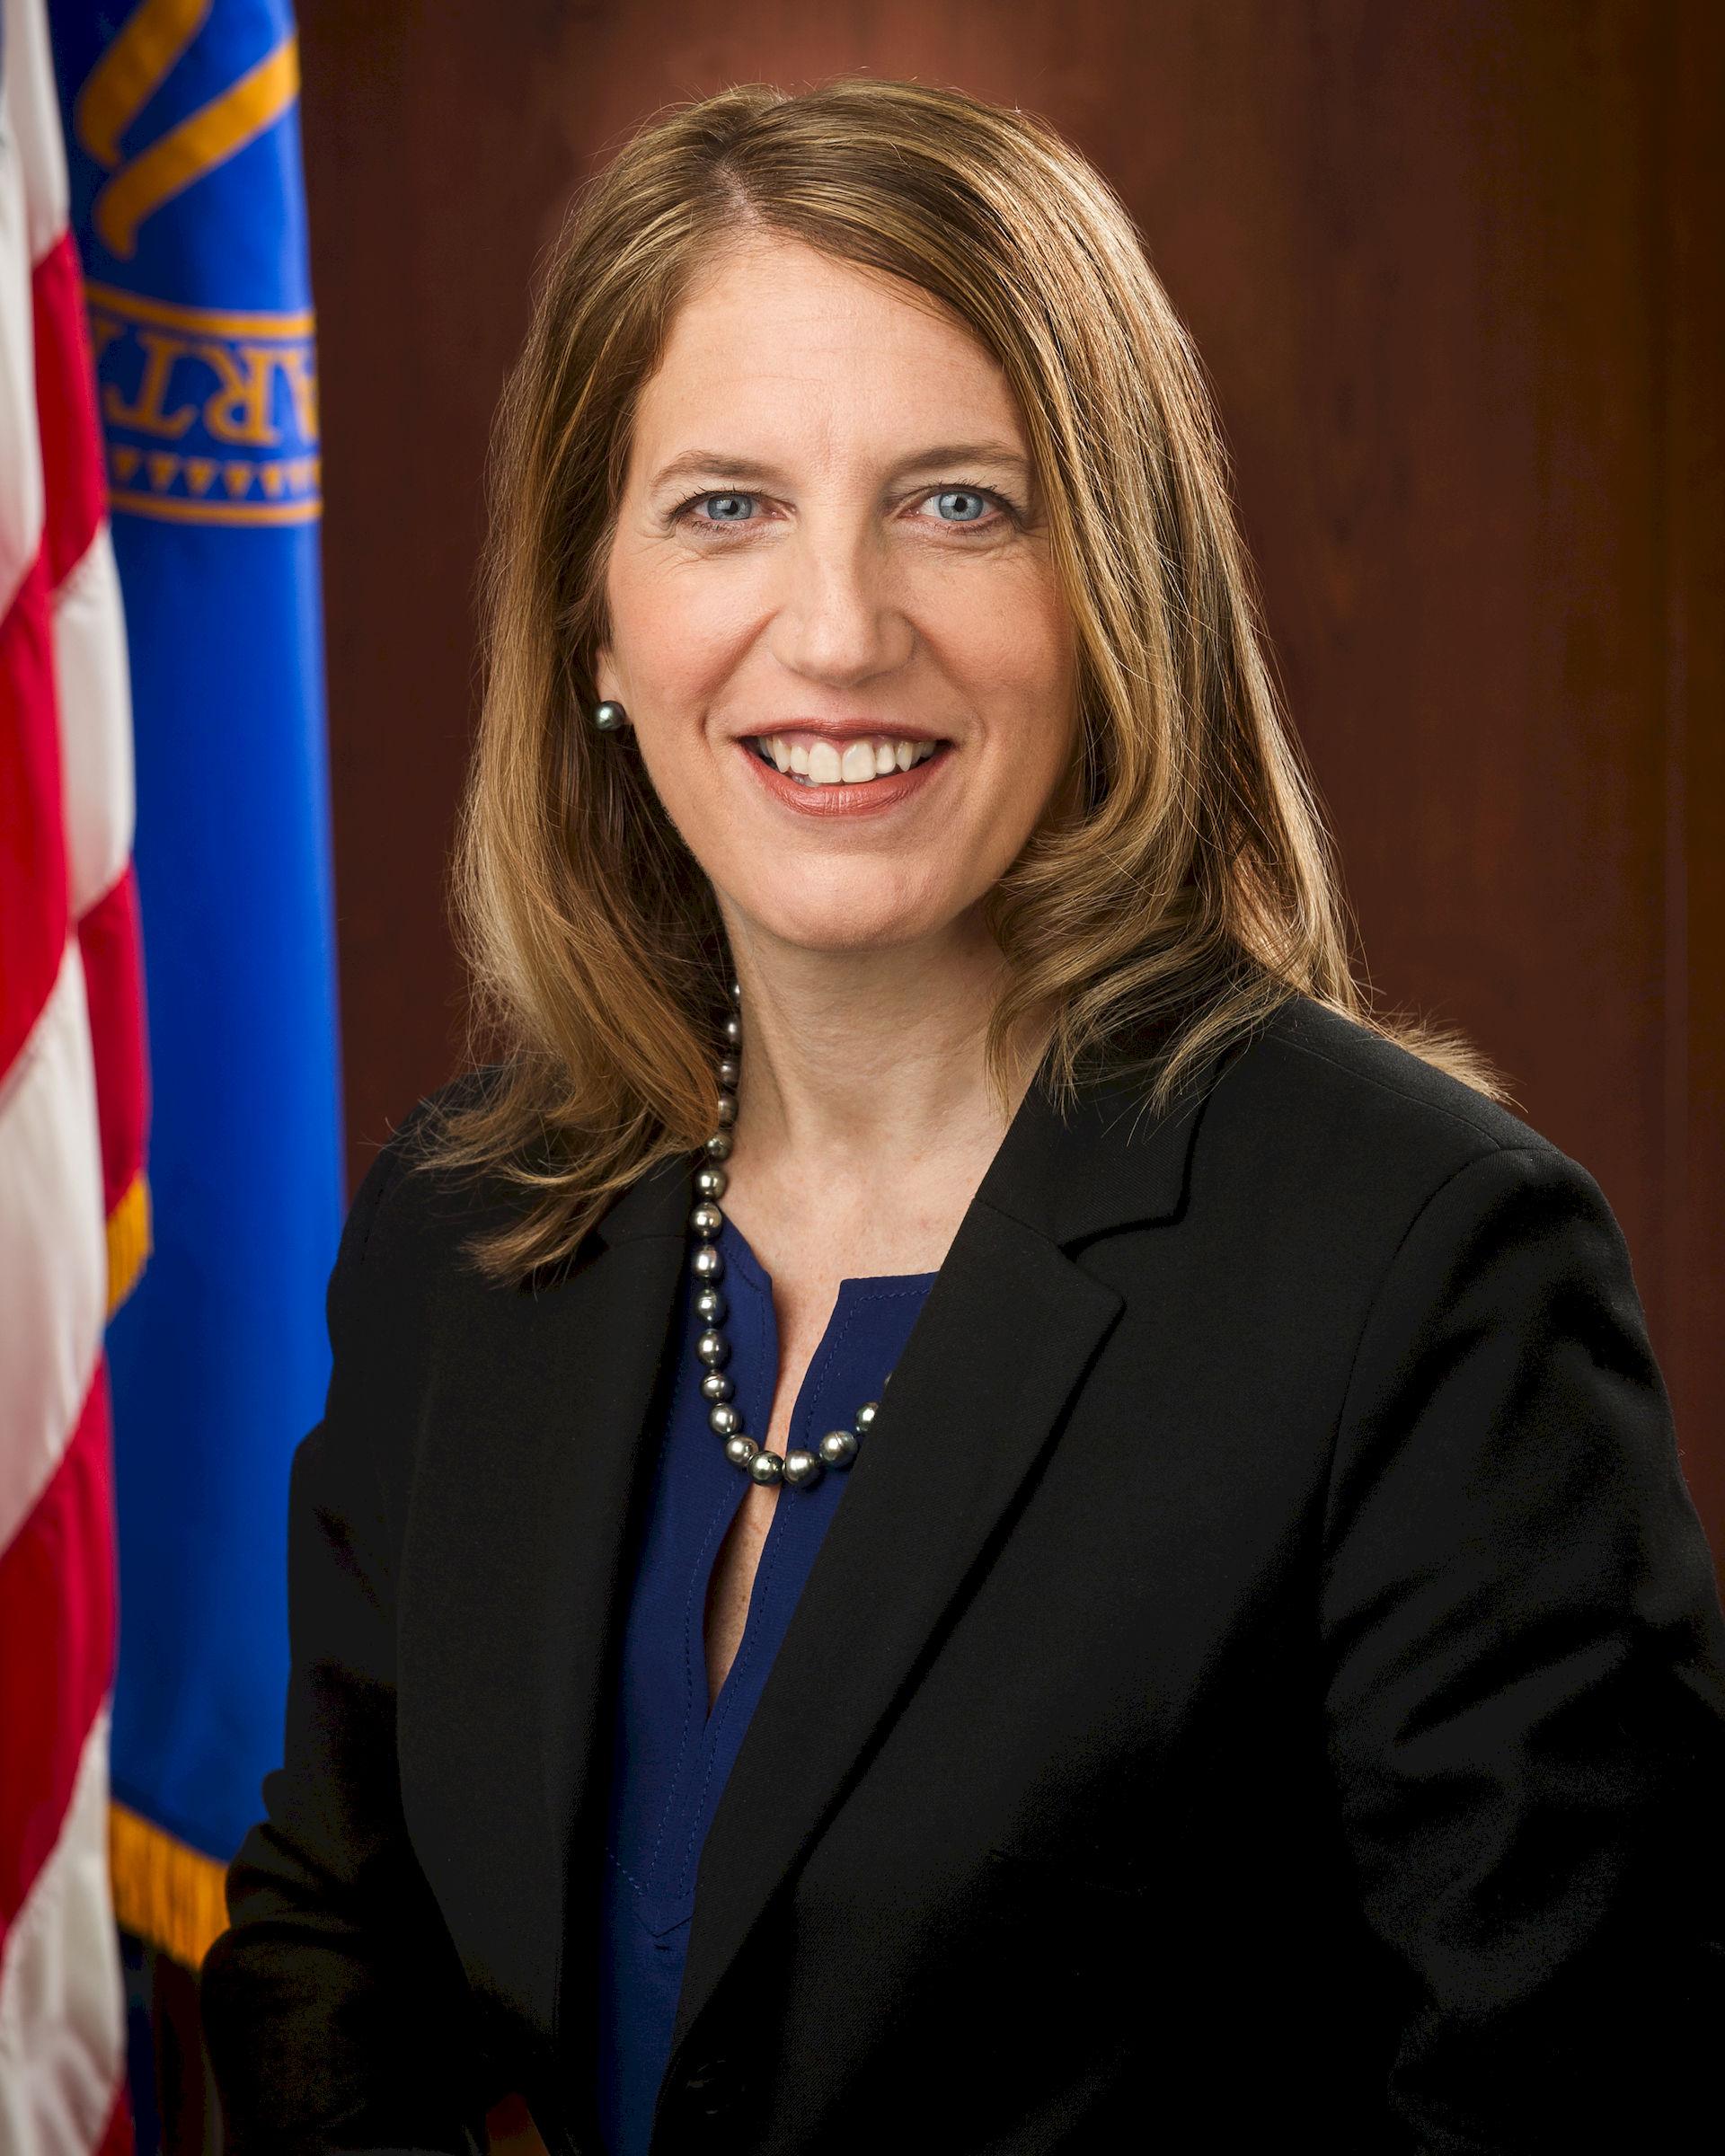 Photo of Sylvia Mathews Burwell: 22nd United States Secretary of Health and Human Services